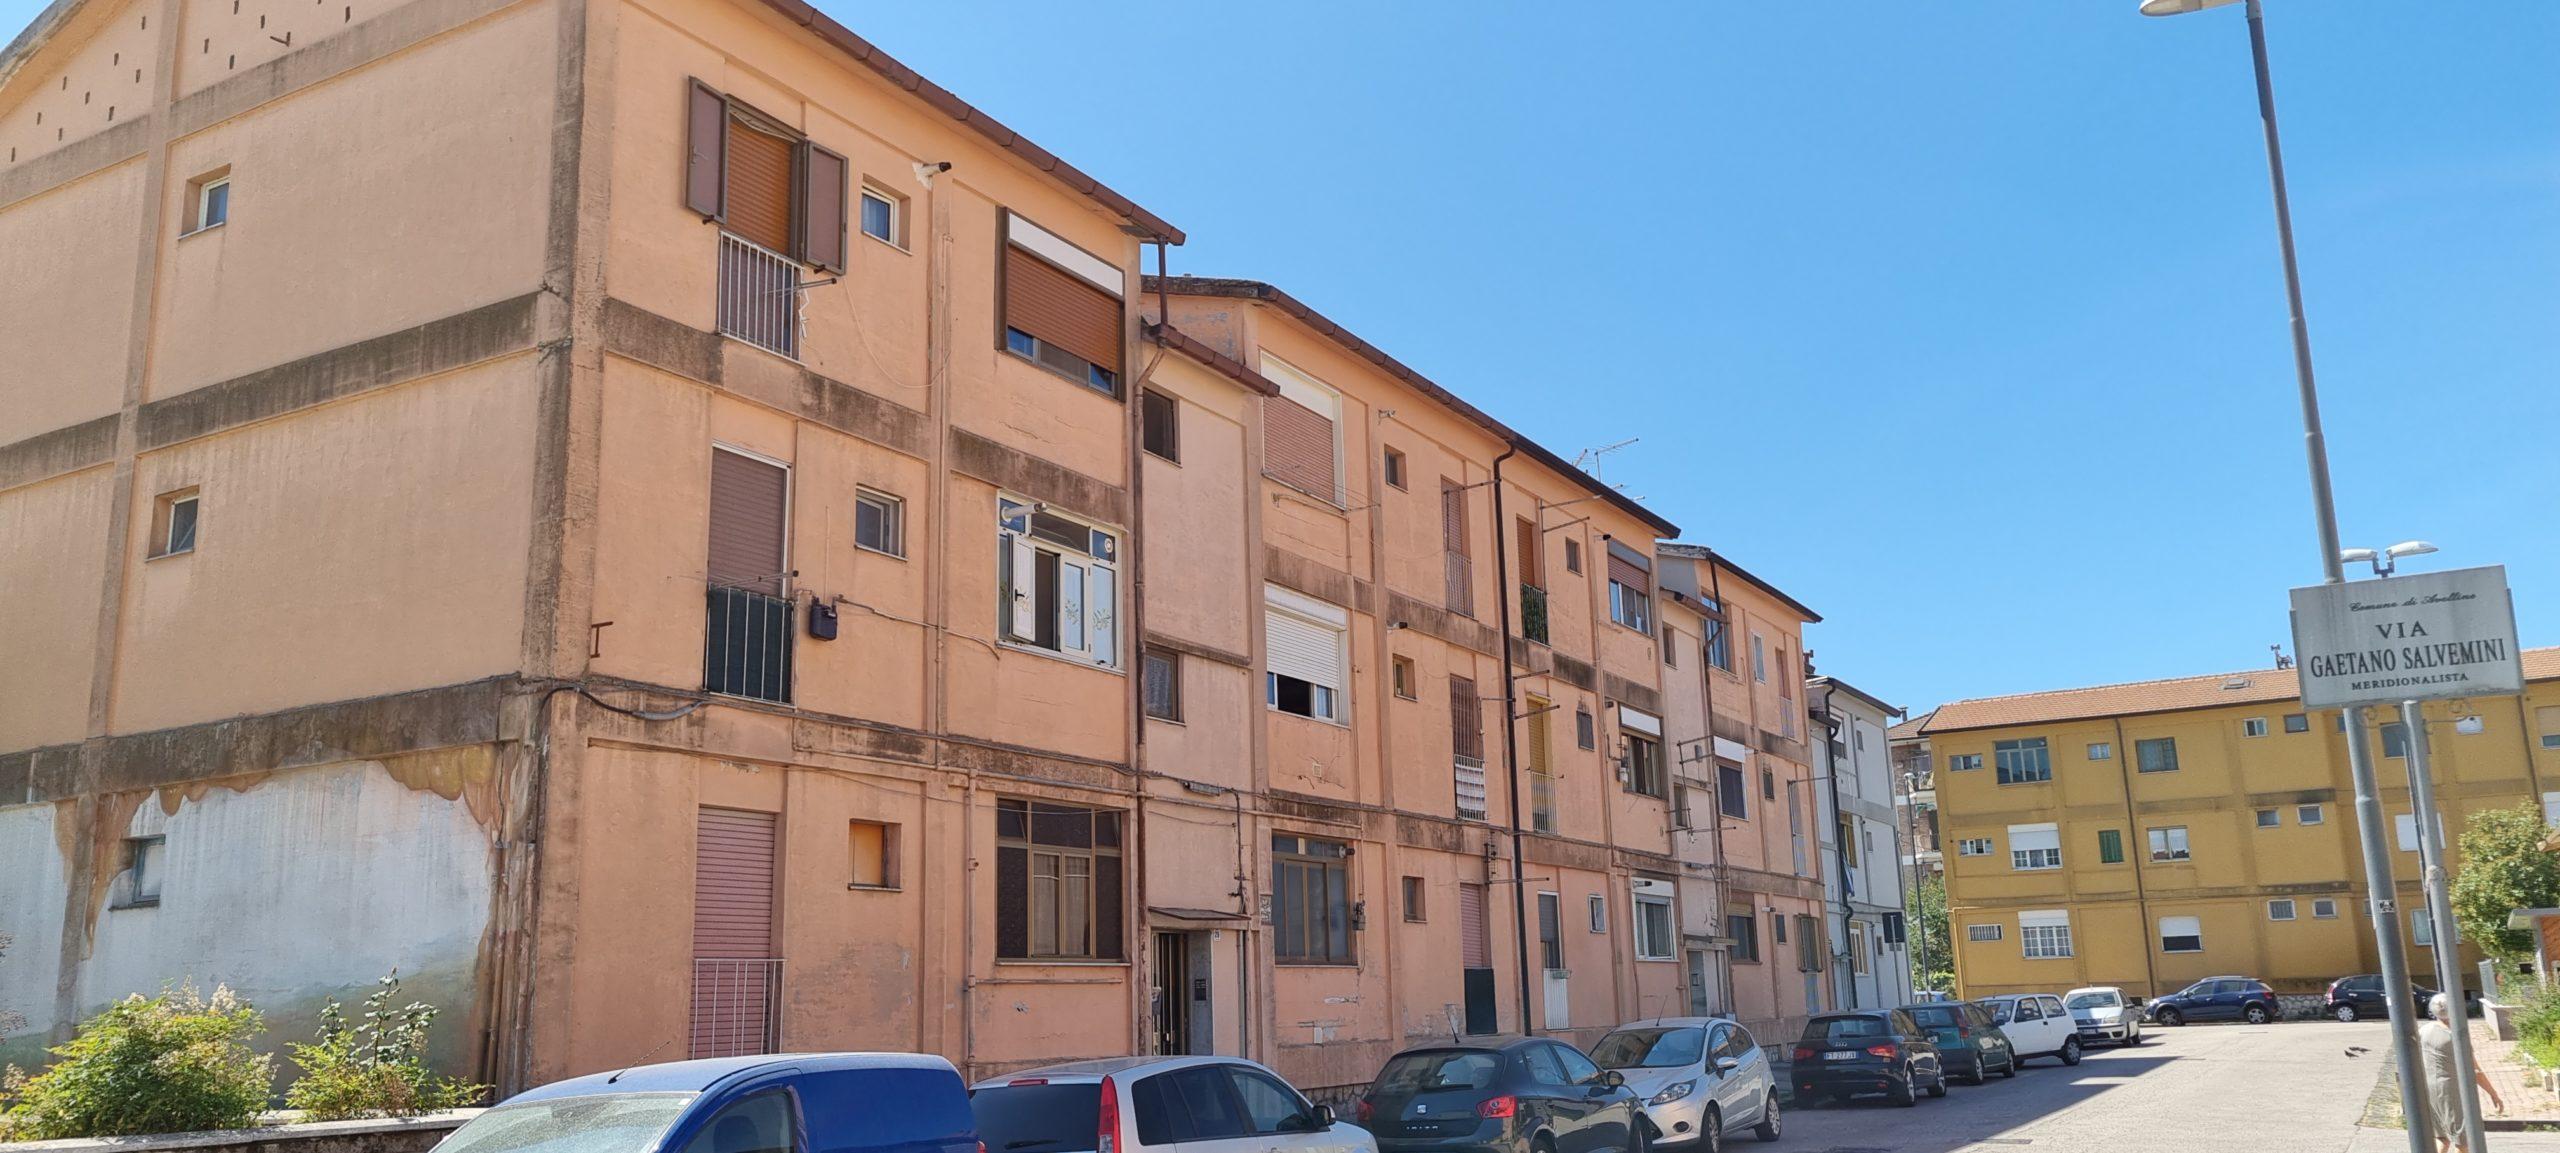 Appartamento, Via Gaetano Salvemini, 29, Avellino